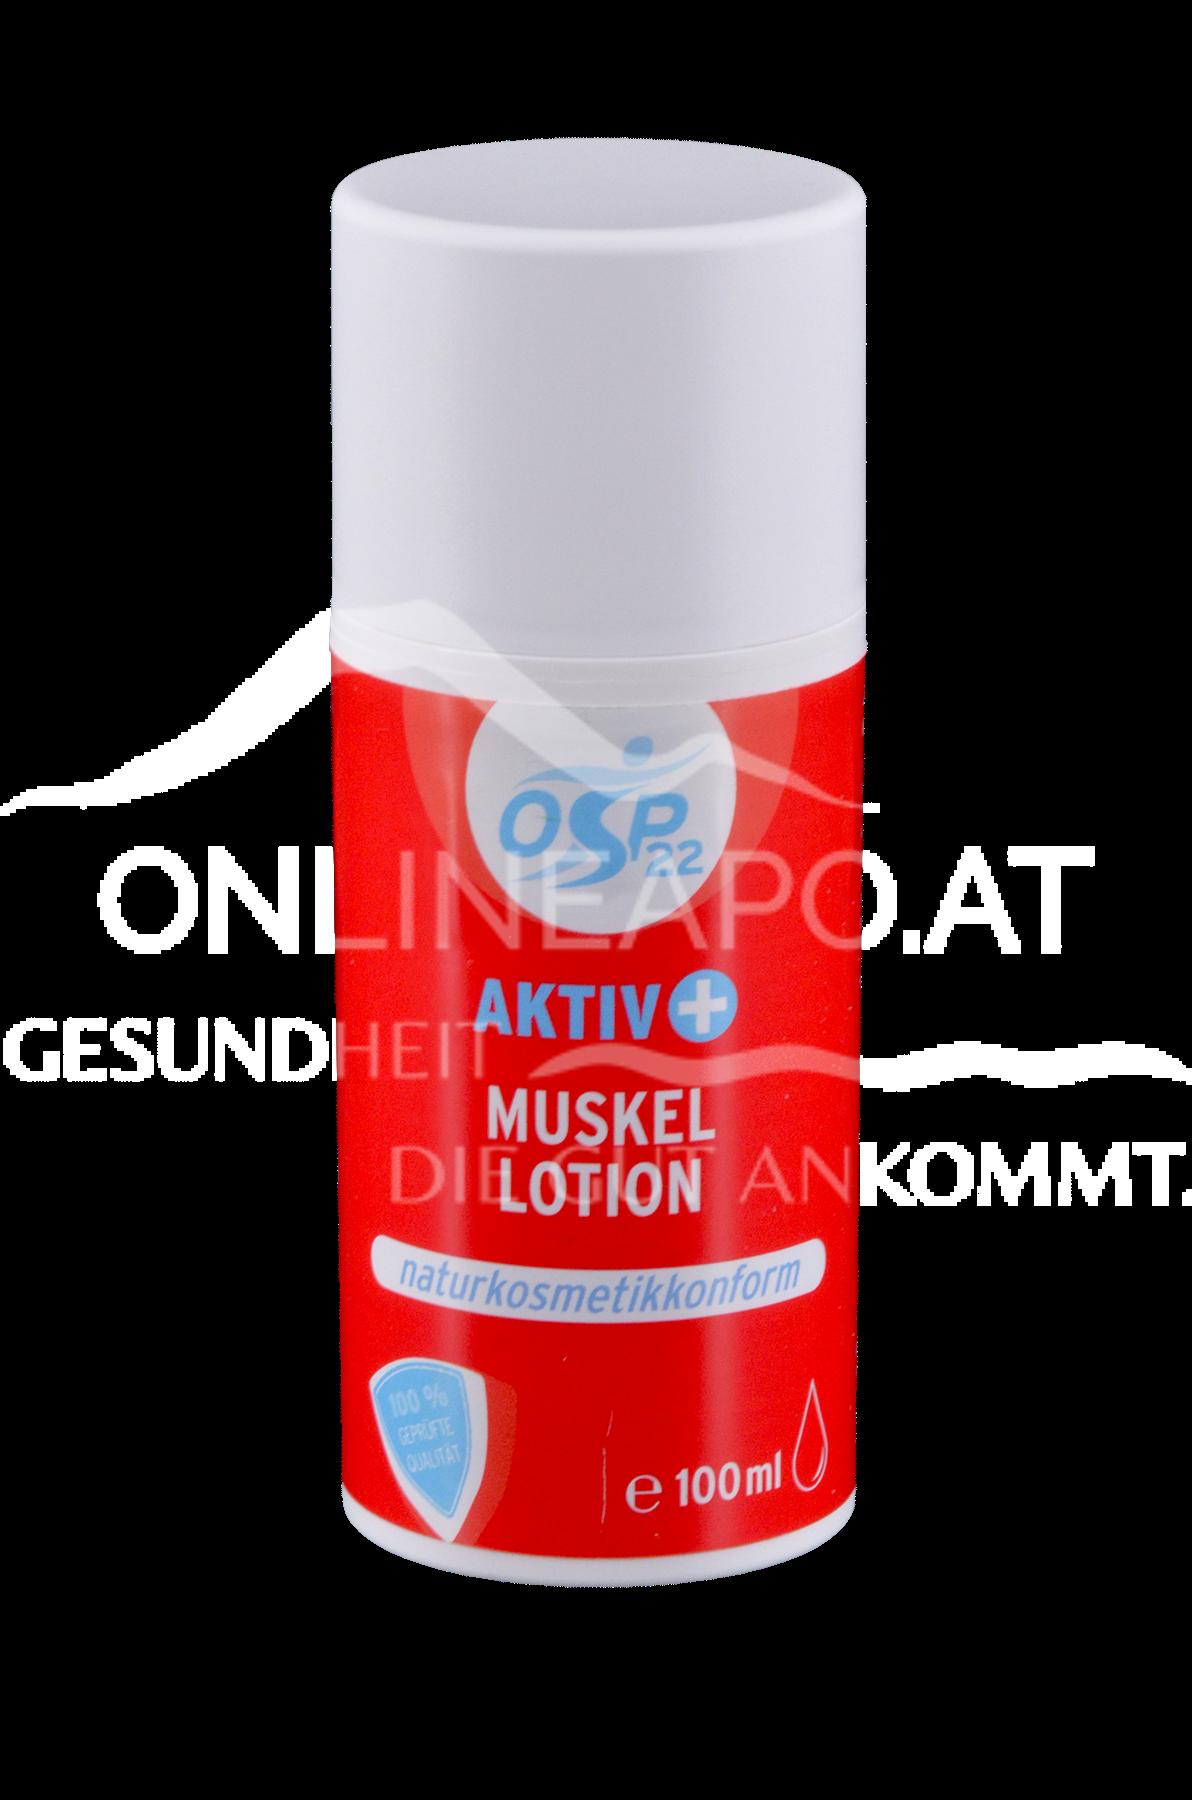 OSP22 Aktiv+ Muskel Lotion